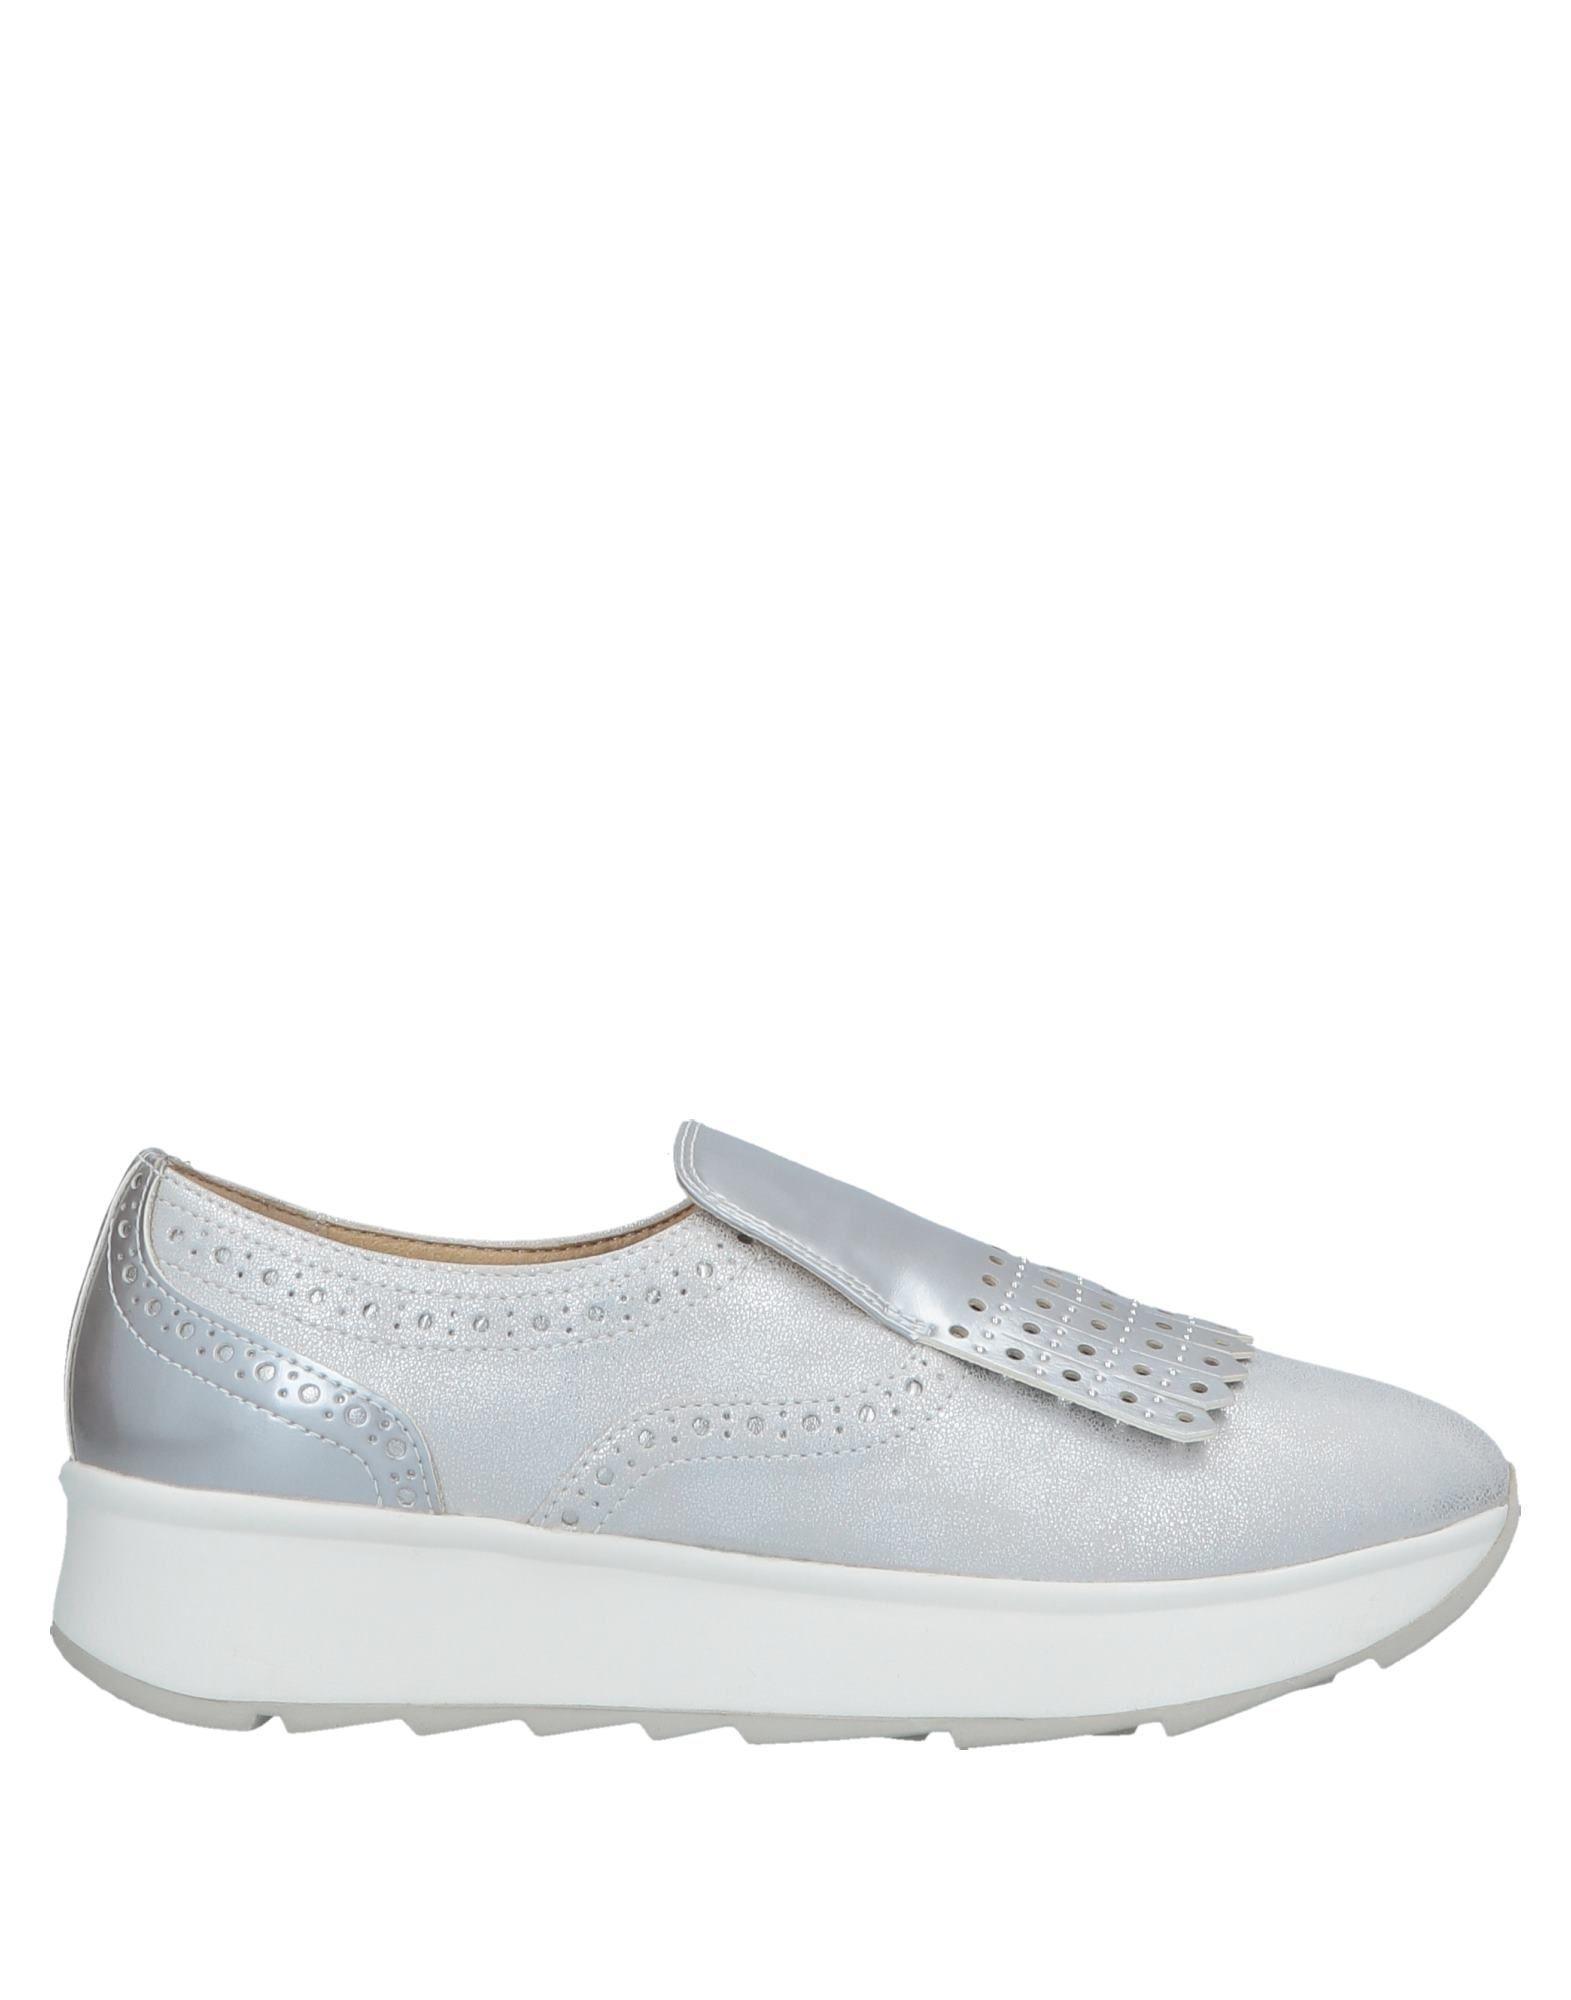 Sneakersamp; Lyst Geox Gris De Deportivas Color 3R54LqAj